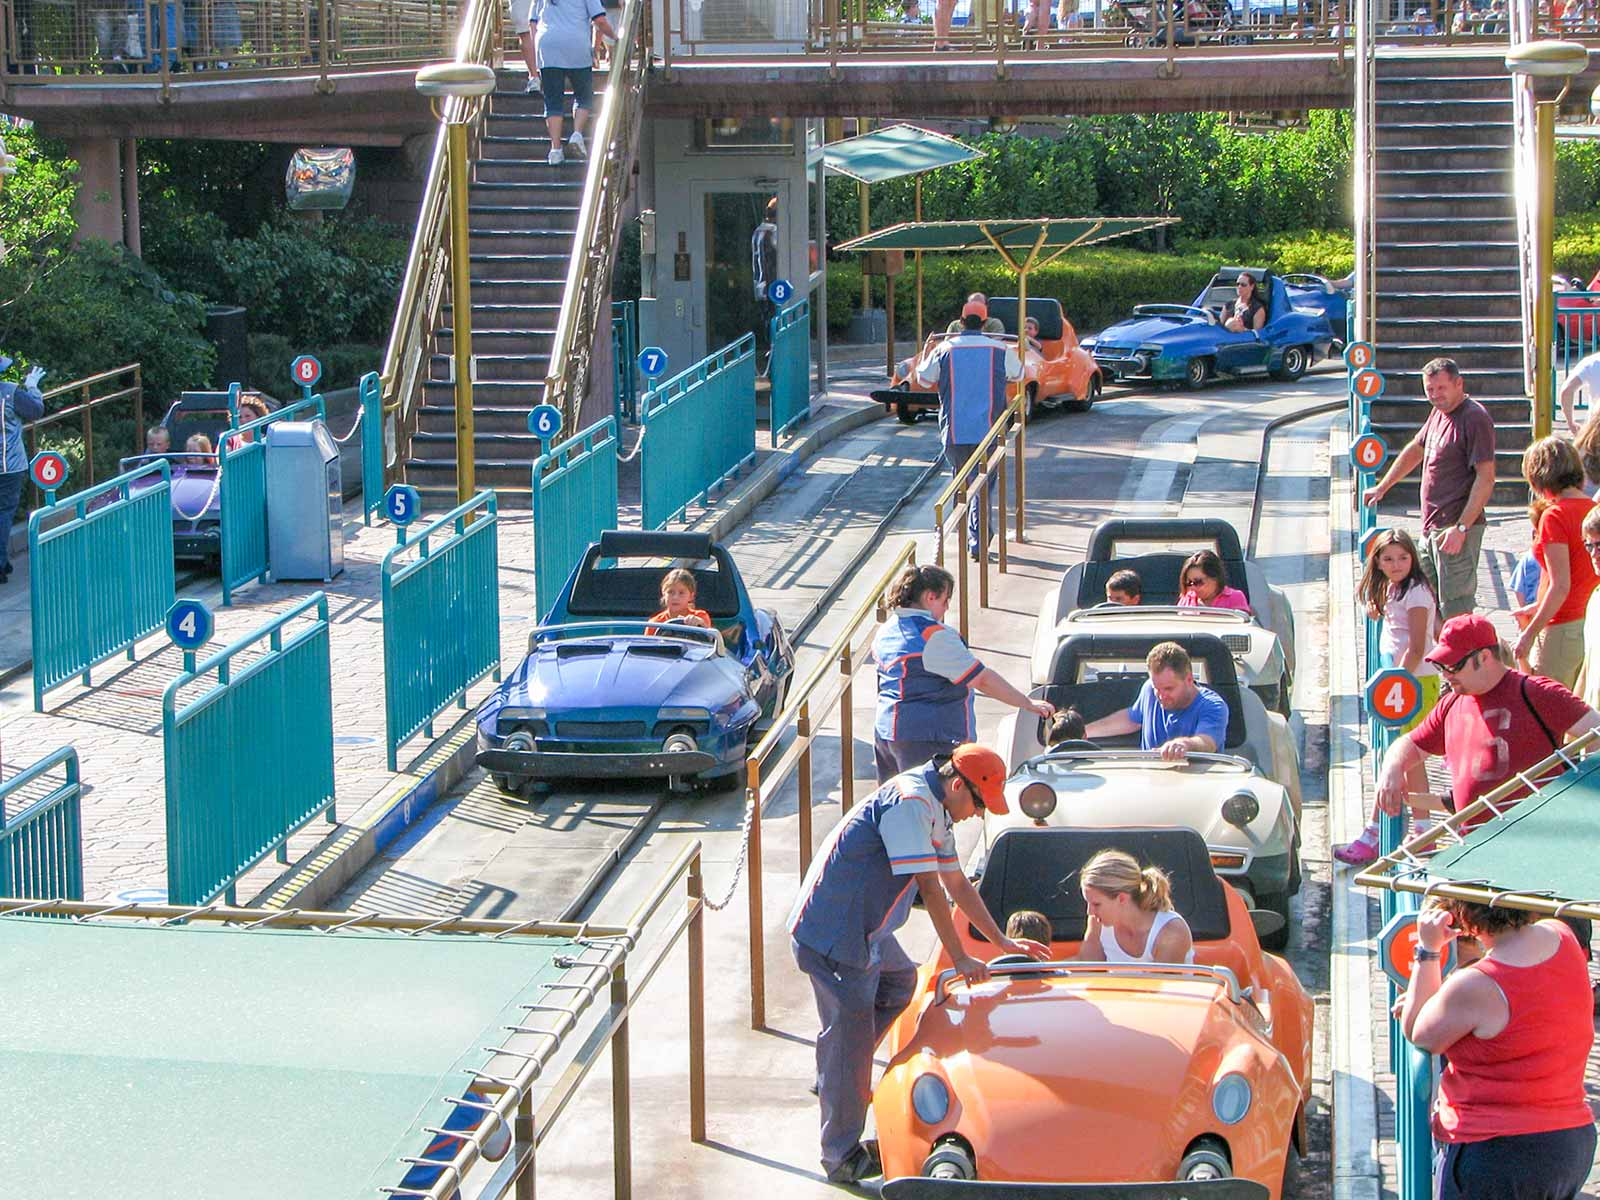 Disneyland Autopia Loading Area | DaveTavres.com